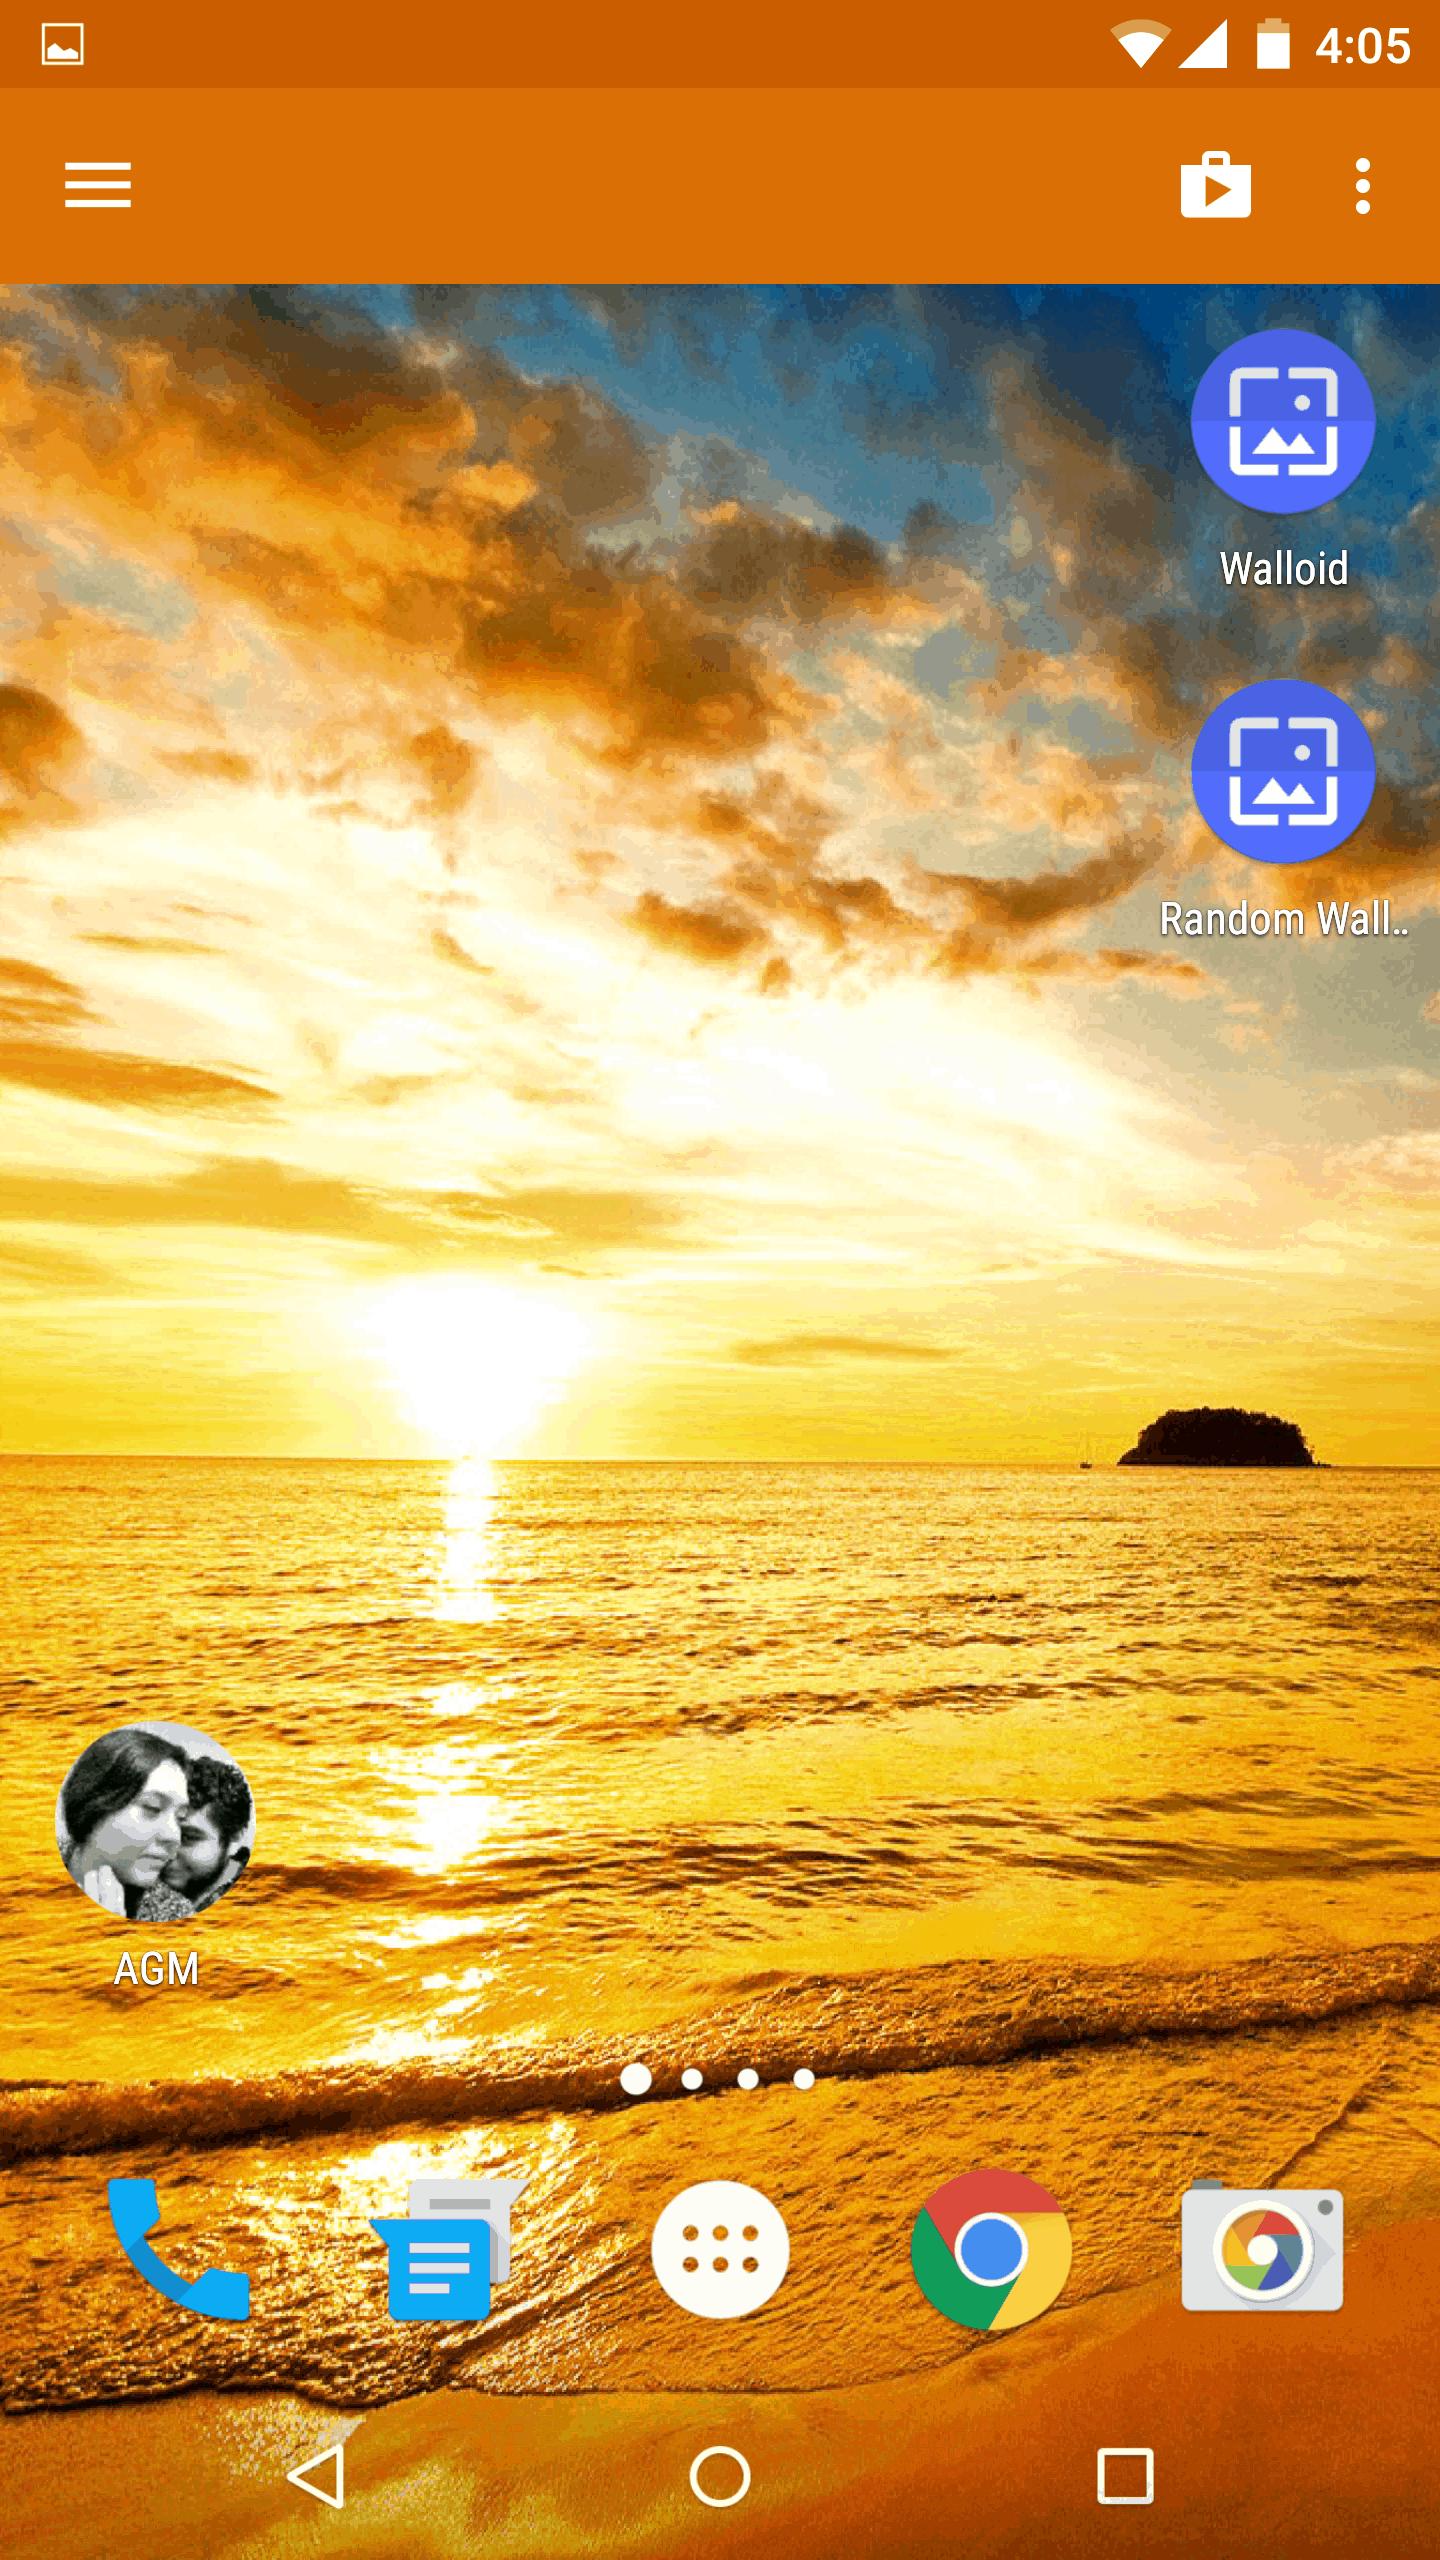 Screenshot_2015-04-26-16-05-42